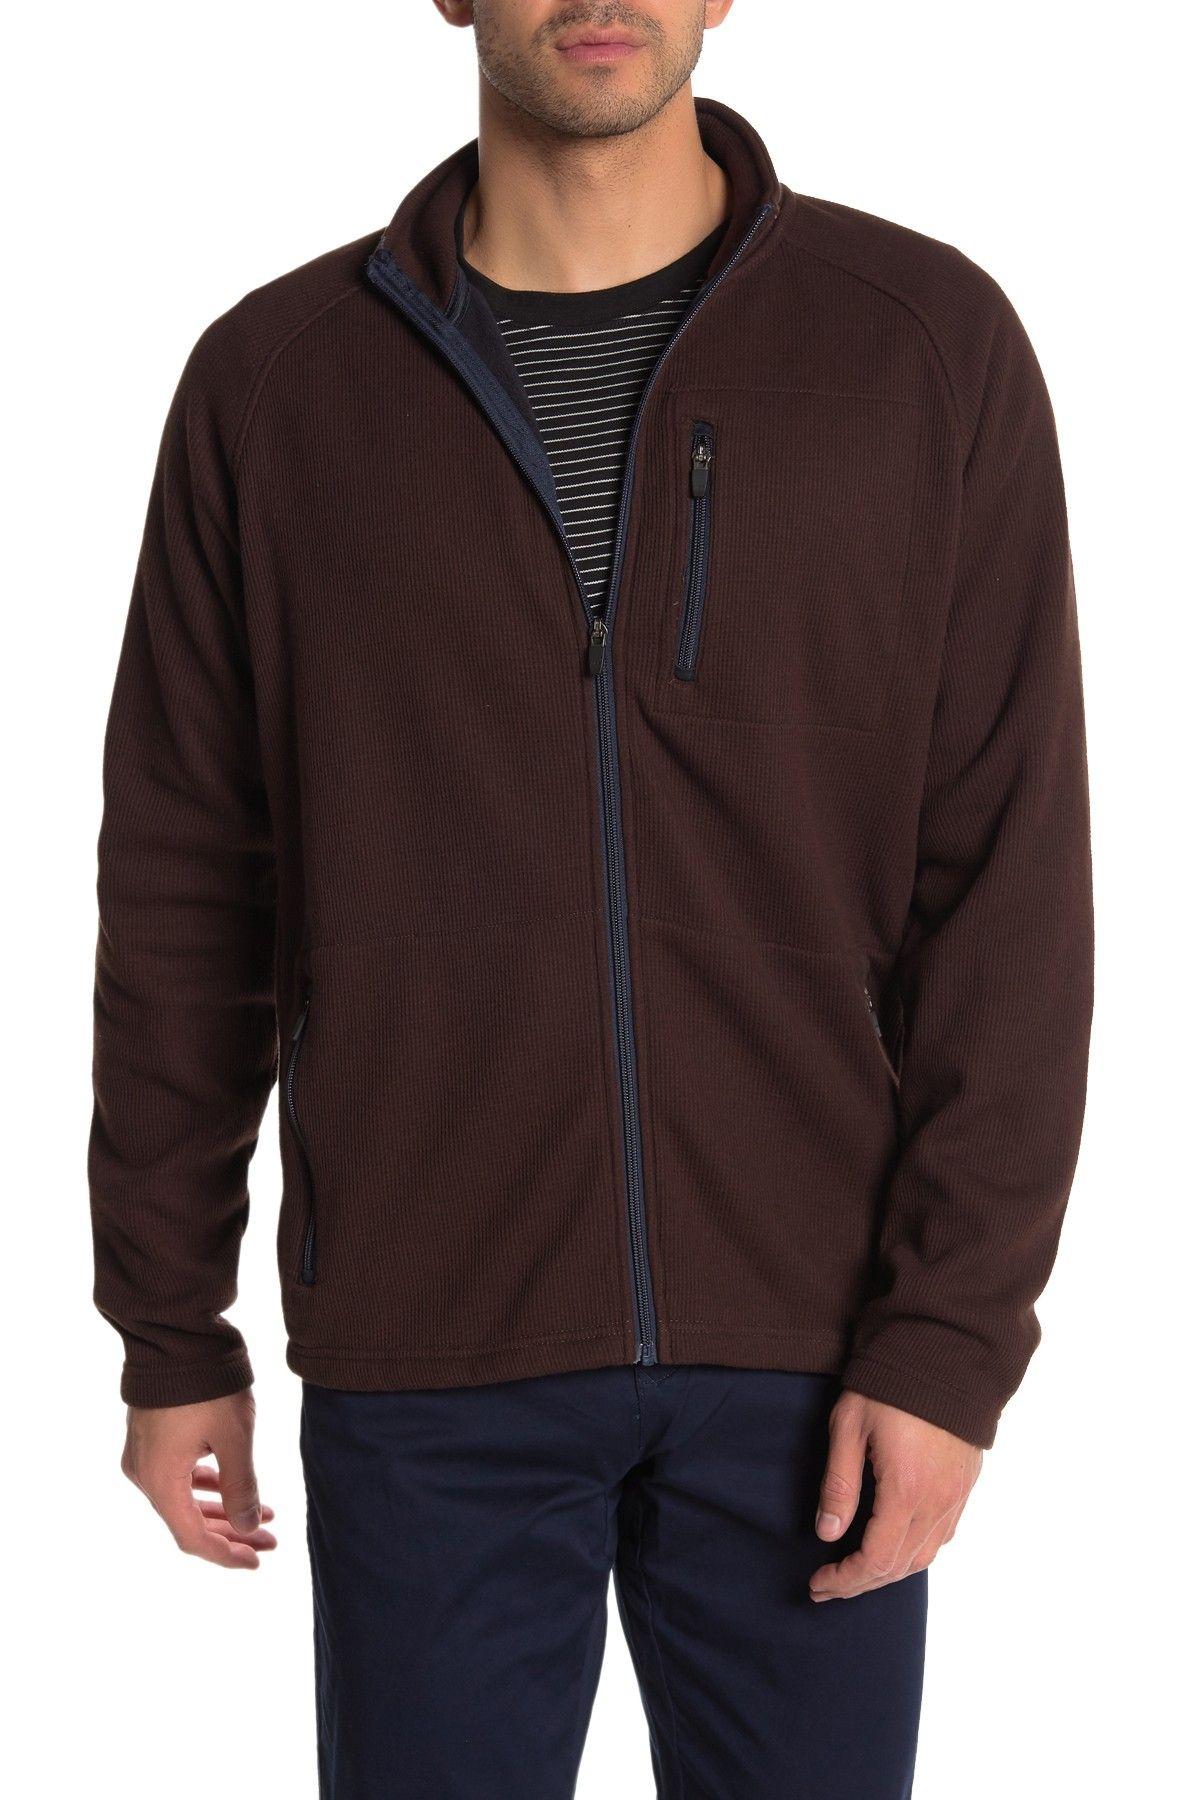 Tailor Vintage Mens Jacket Brown Size Medium M Full-Zip Fleece Lined